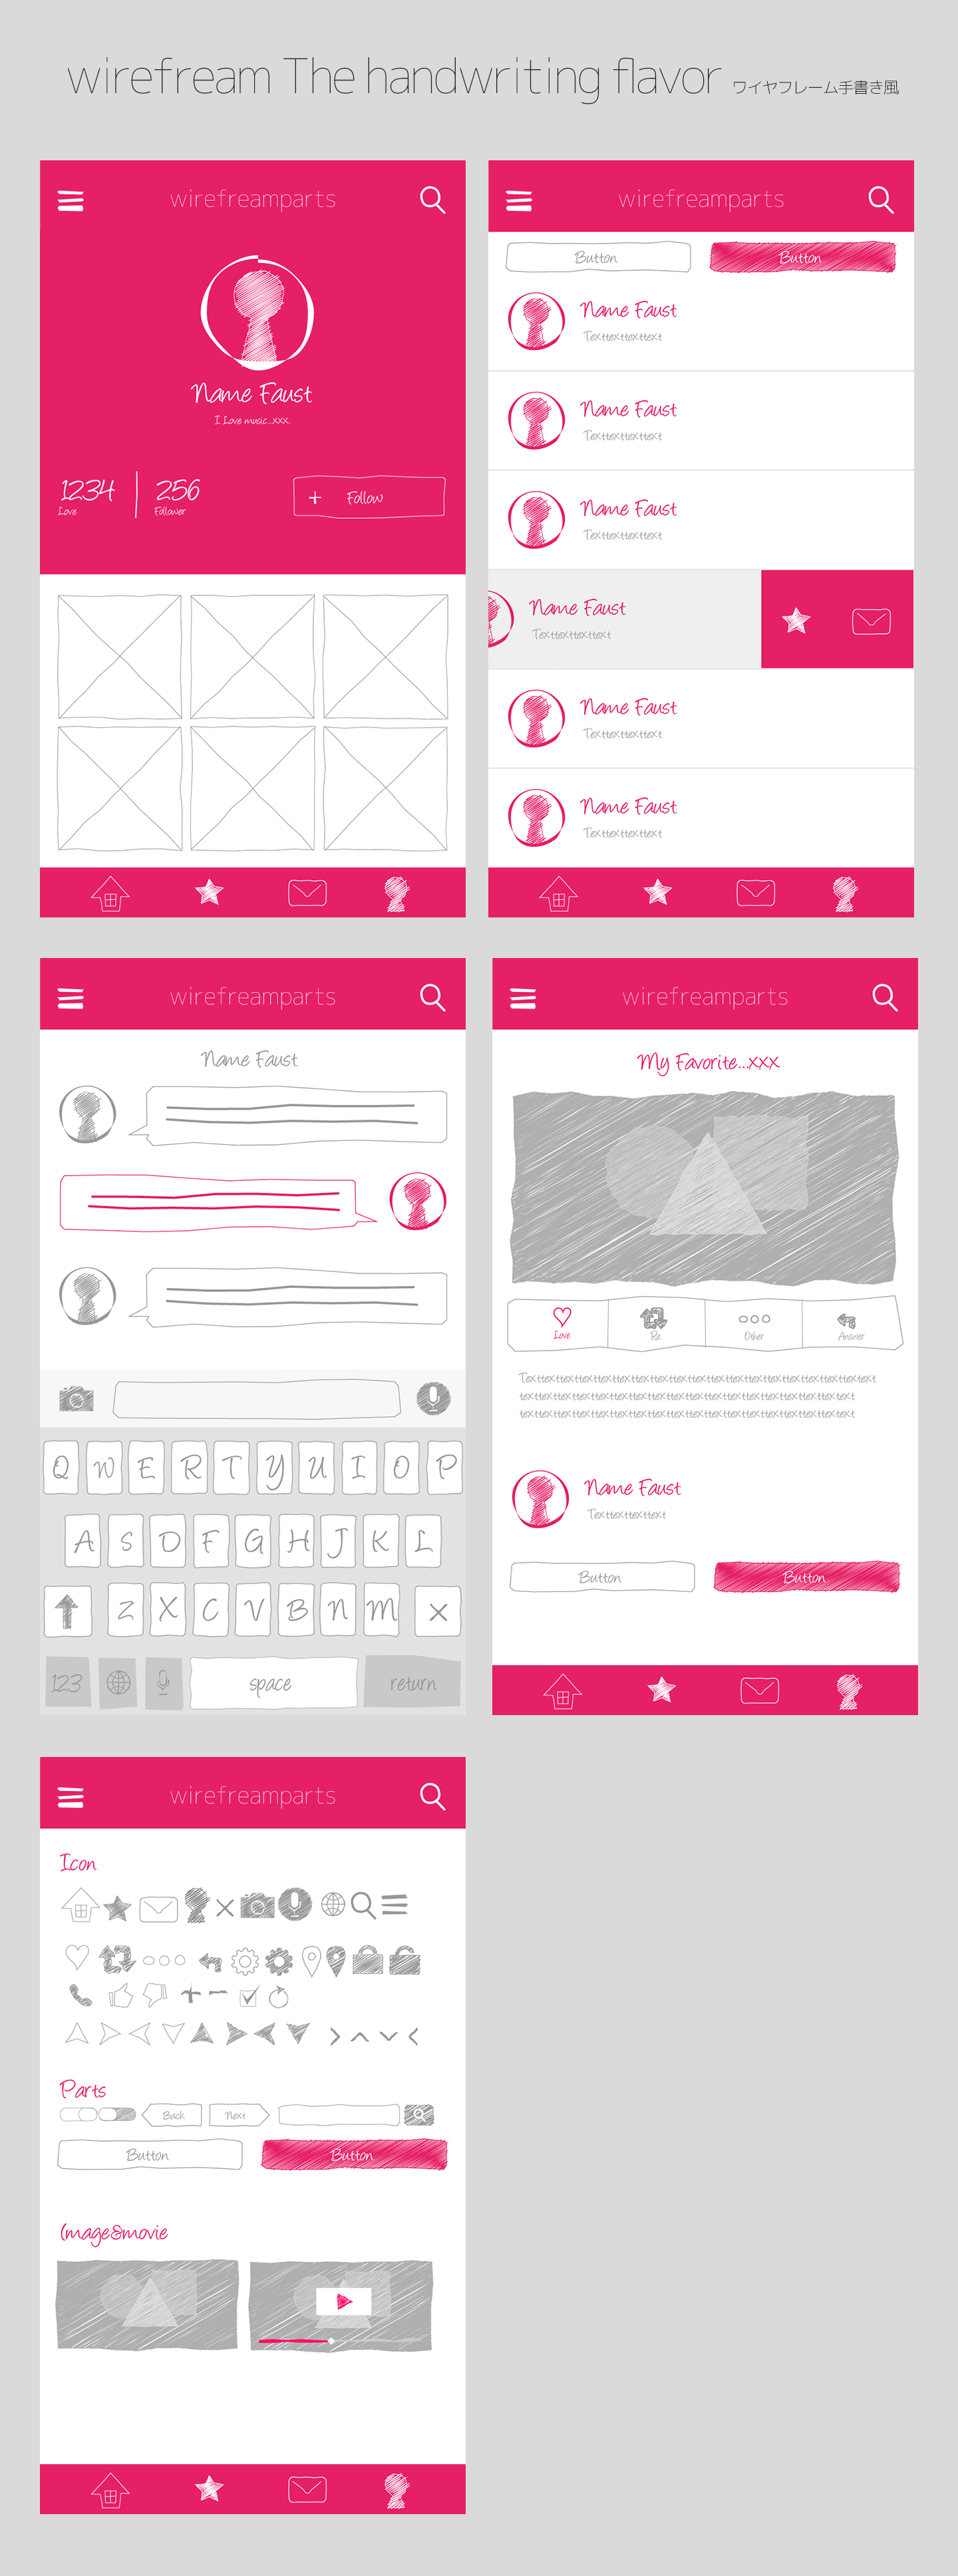 wirefream The handwriting flavor  ワイヤーフレーム 手書き風 #Illustrator #wirefream